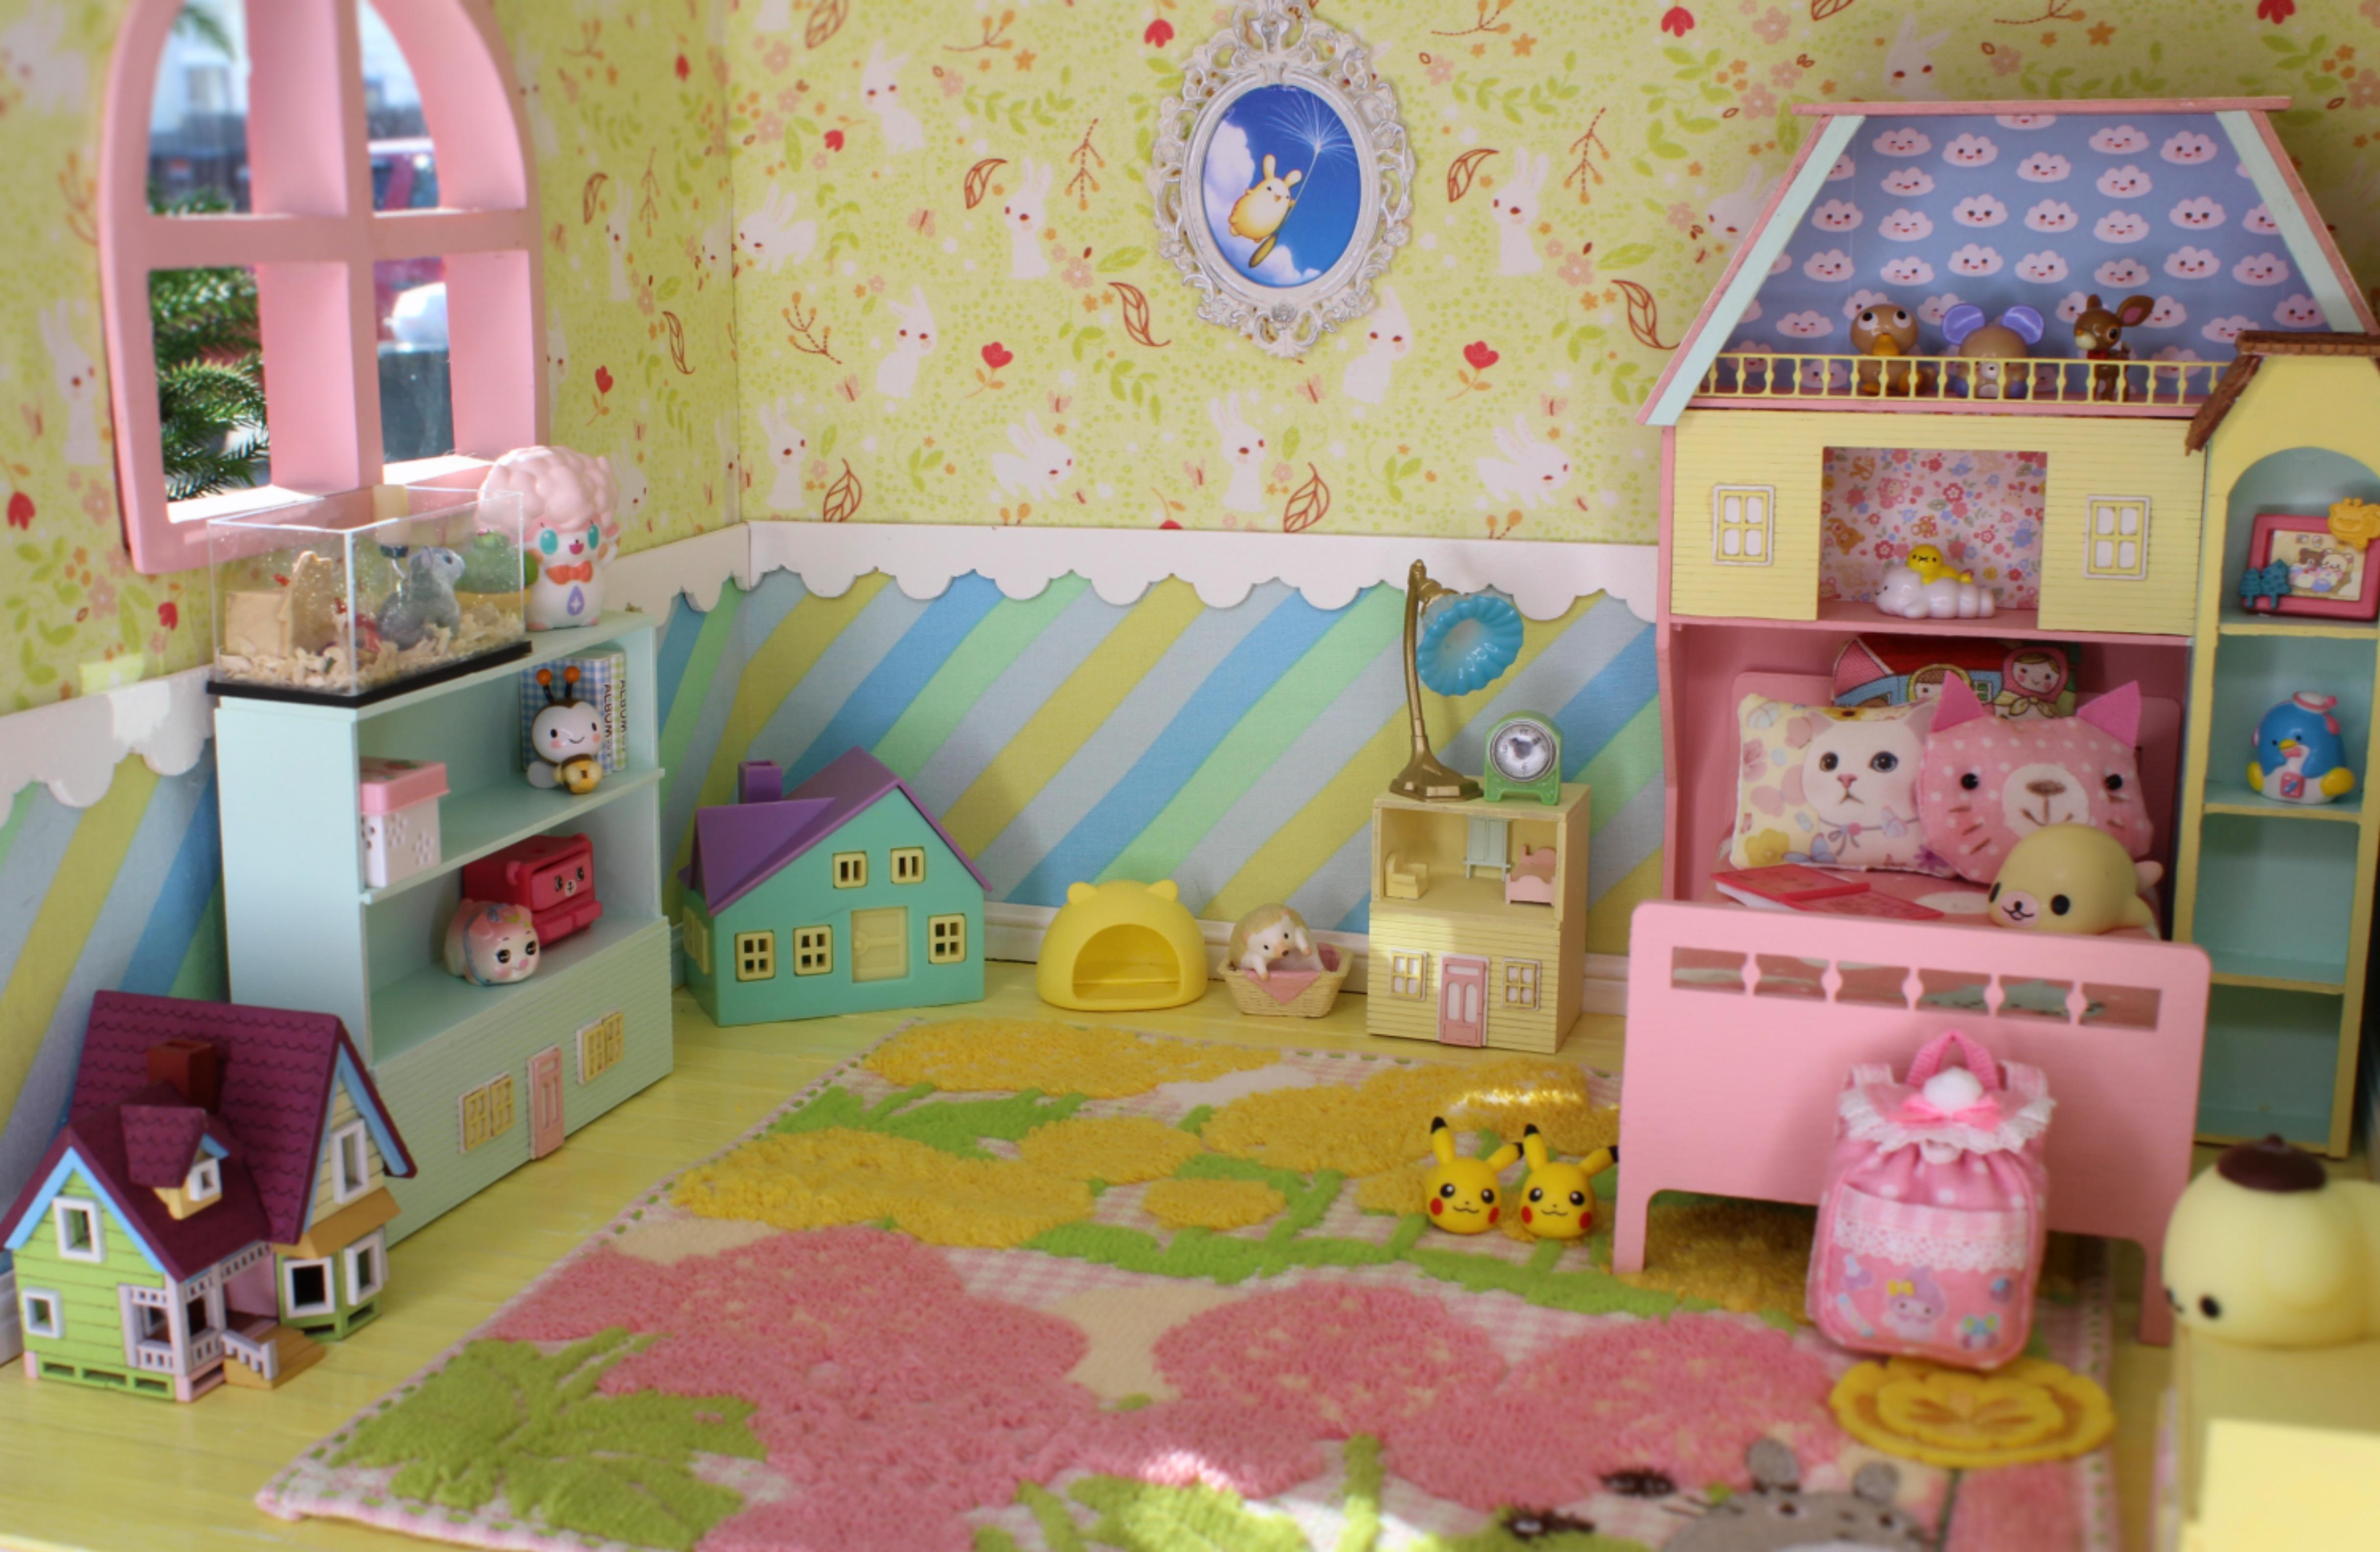 Dollhouse Furniture Infant Bed Room Set Toys For Doll